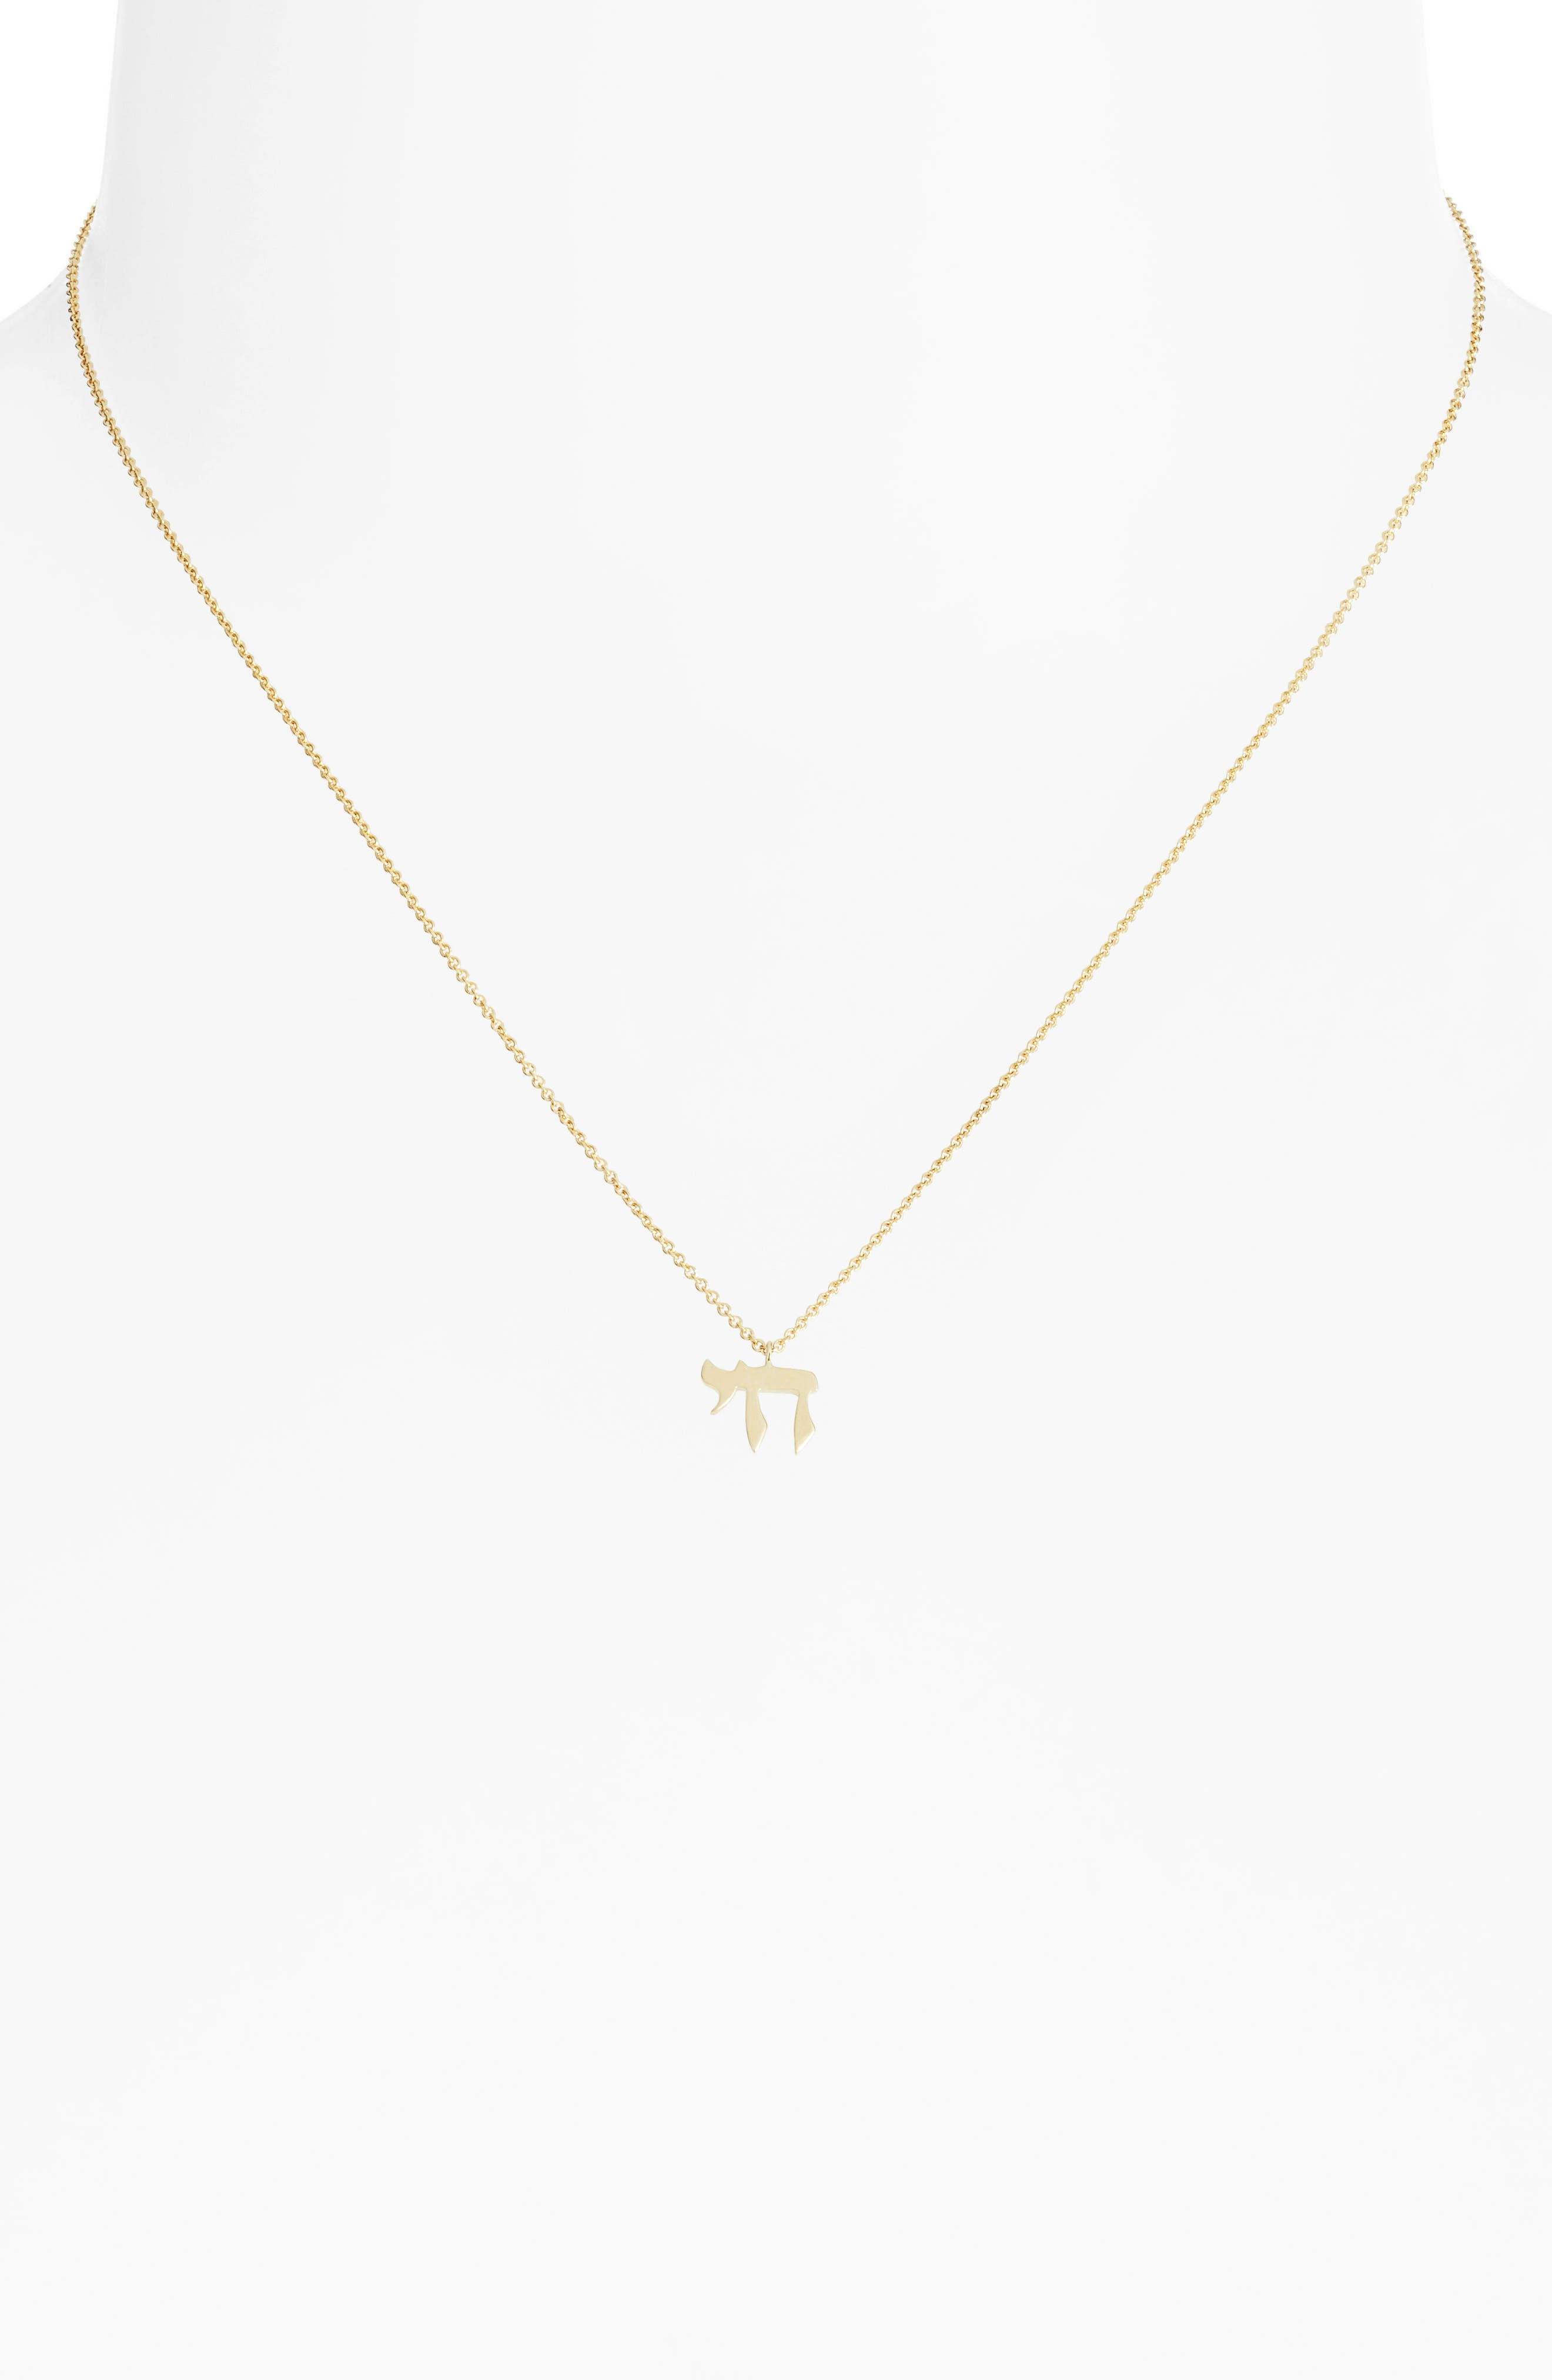 14K Gold Pendant Necklace,                             Alternate thumbnail 2, color,                             YELLOW GOLD/ DIA